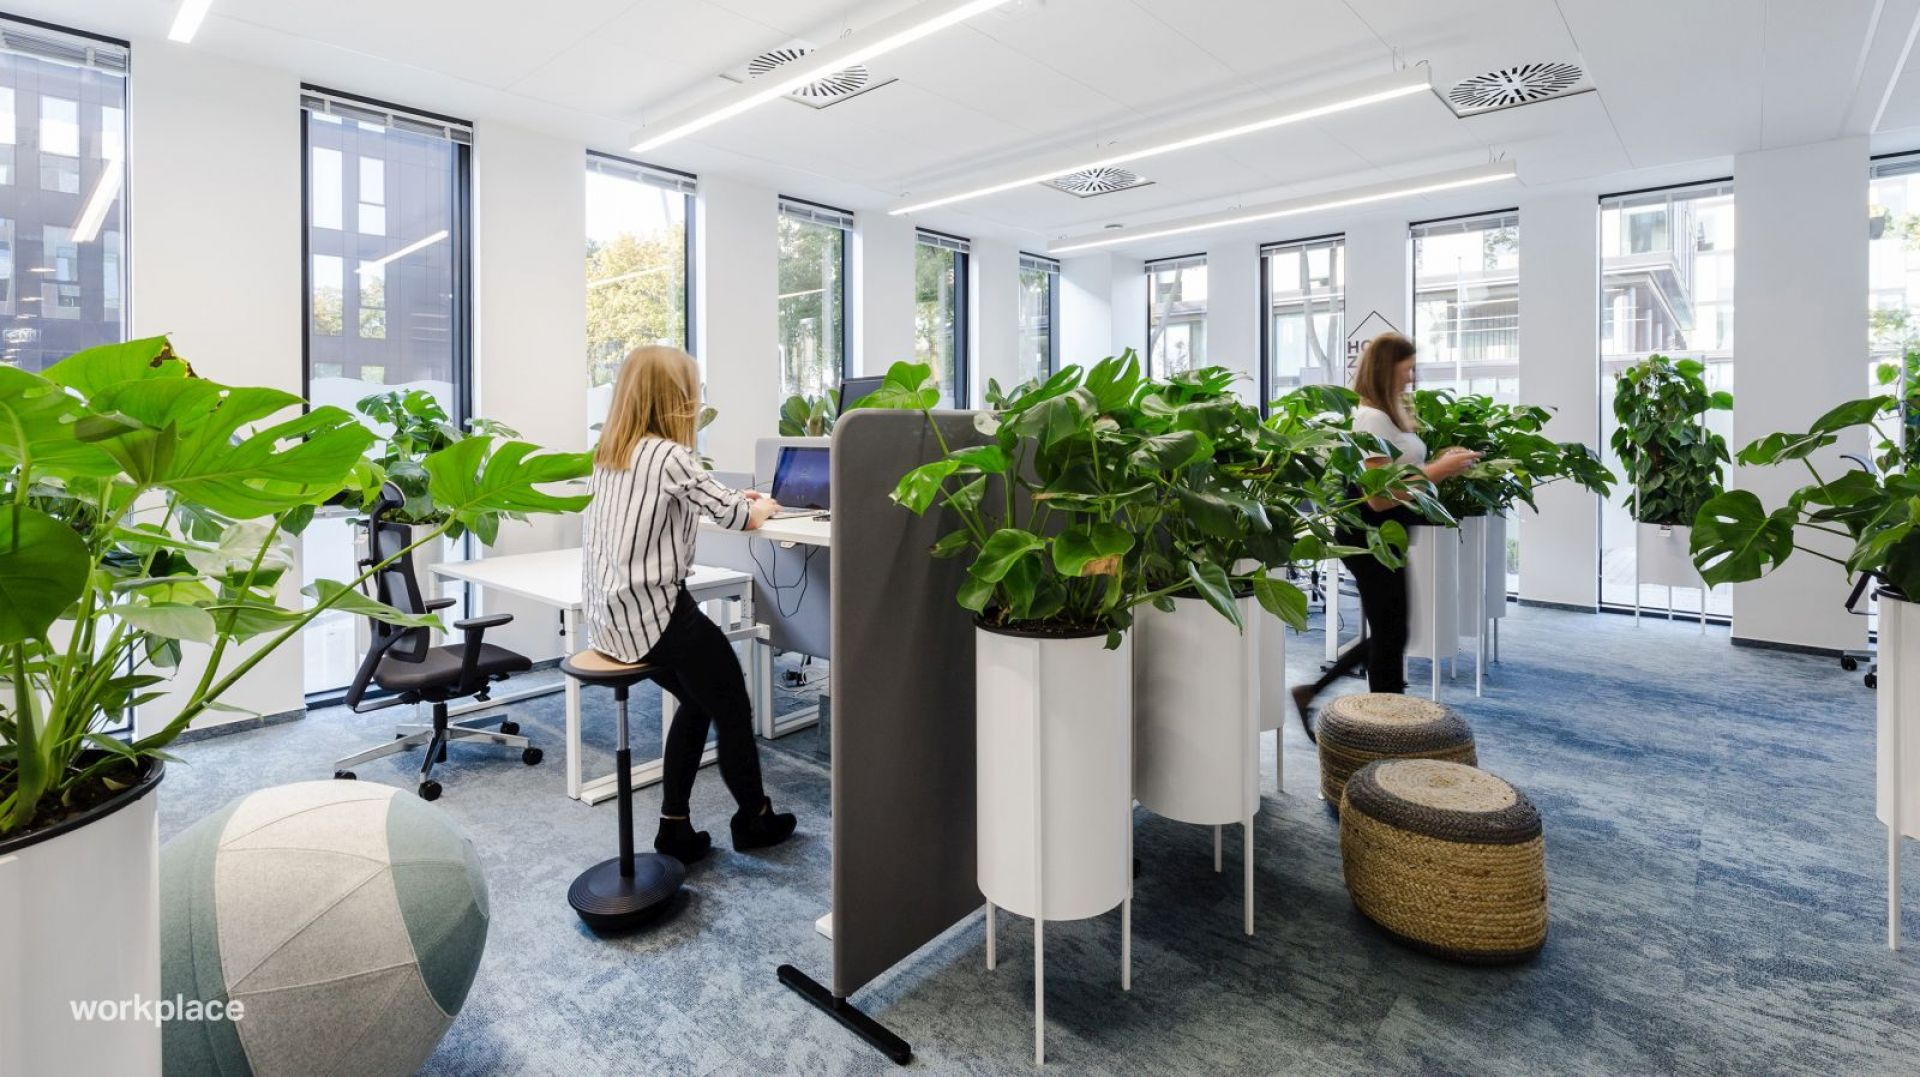 Biuro firmy Nordea. Fot. Workplace Solutionsmat. pras. Workplace SolutionsWE_Nordea_Greenest_3.jpg